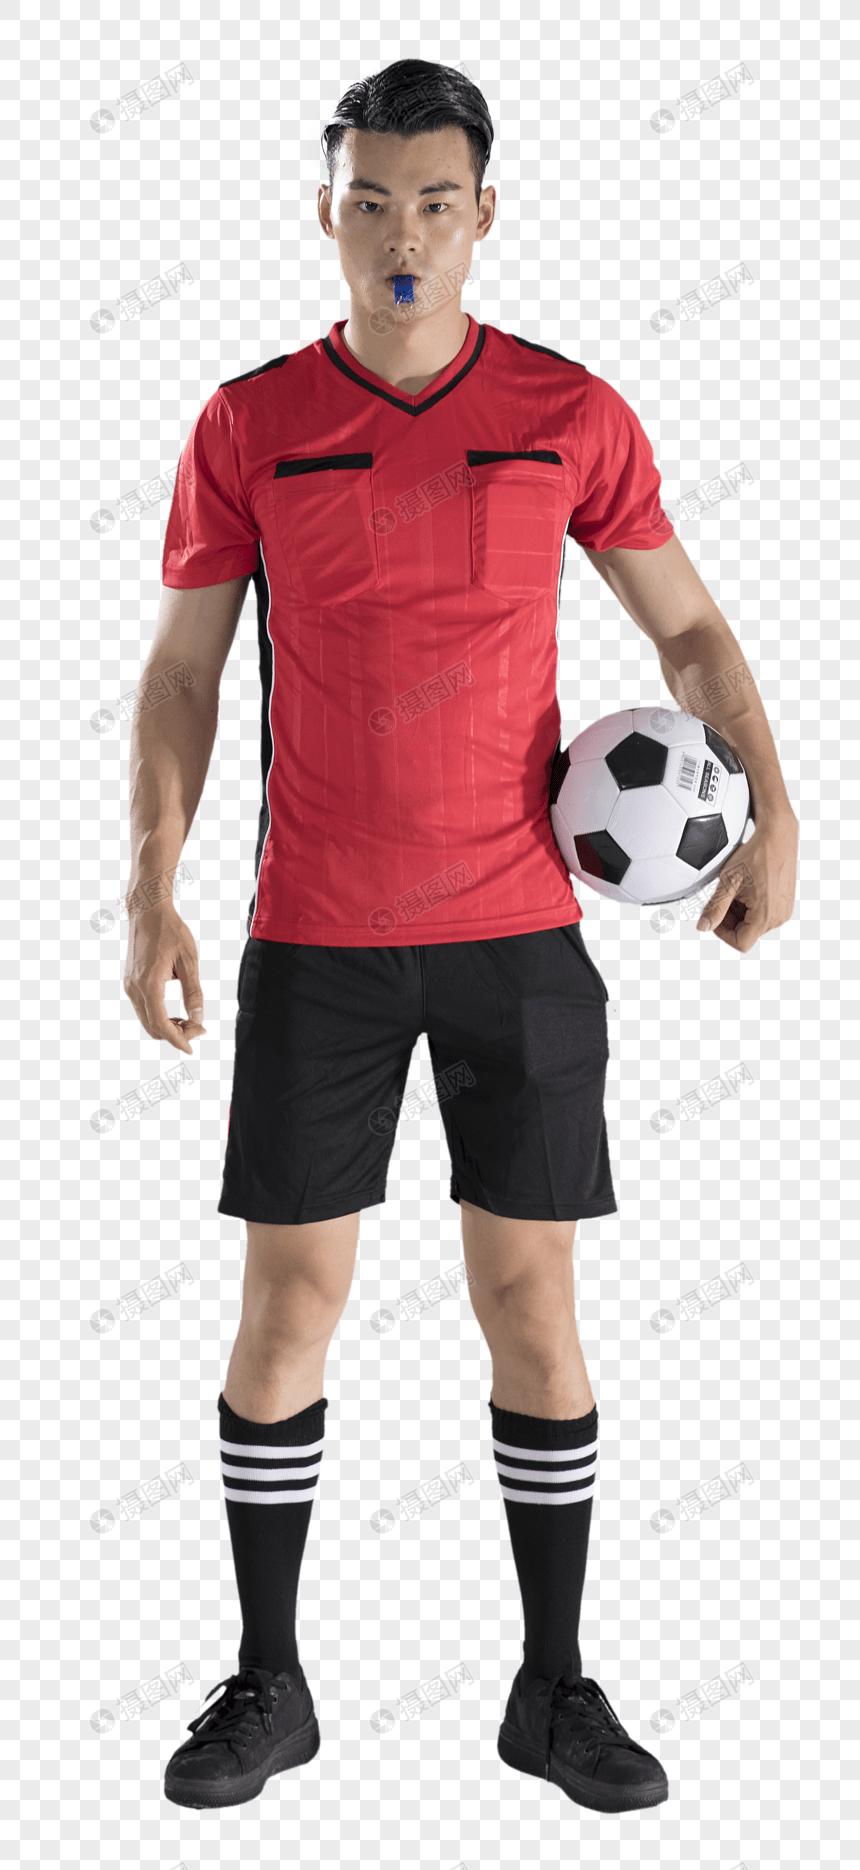 Wasit Sepakbola : wasit, sepakbola, Wasit, Sepakbola, Grafik, Gambar, Unduh, Gratis, Lovepik